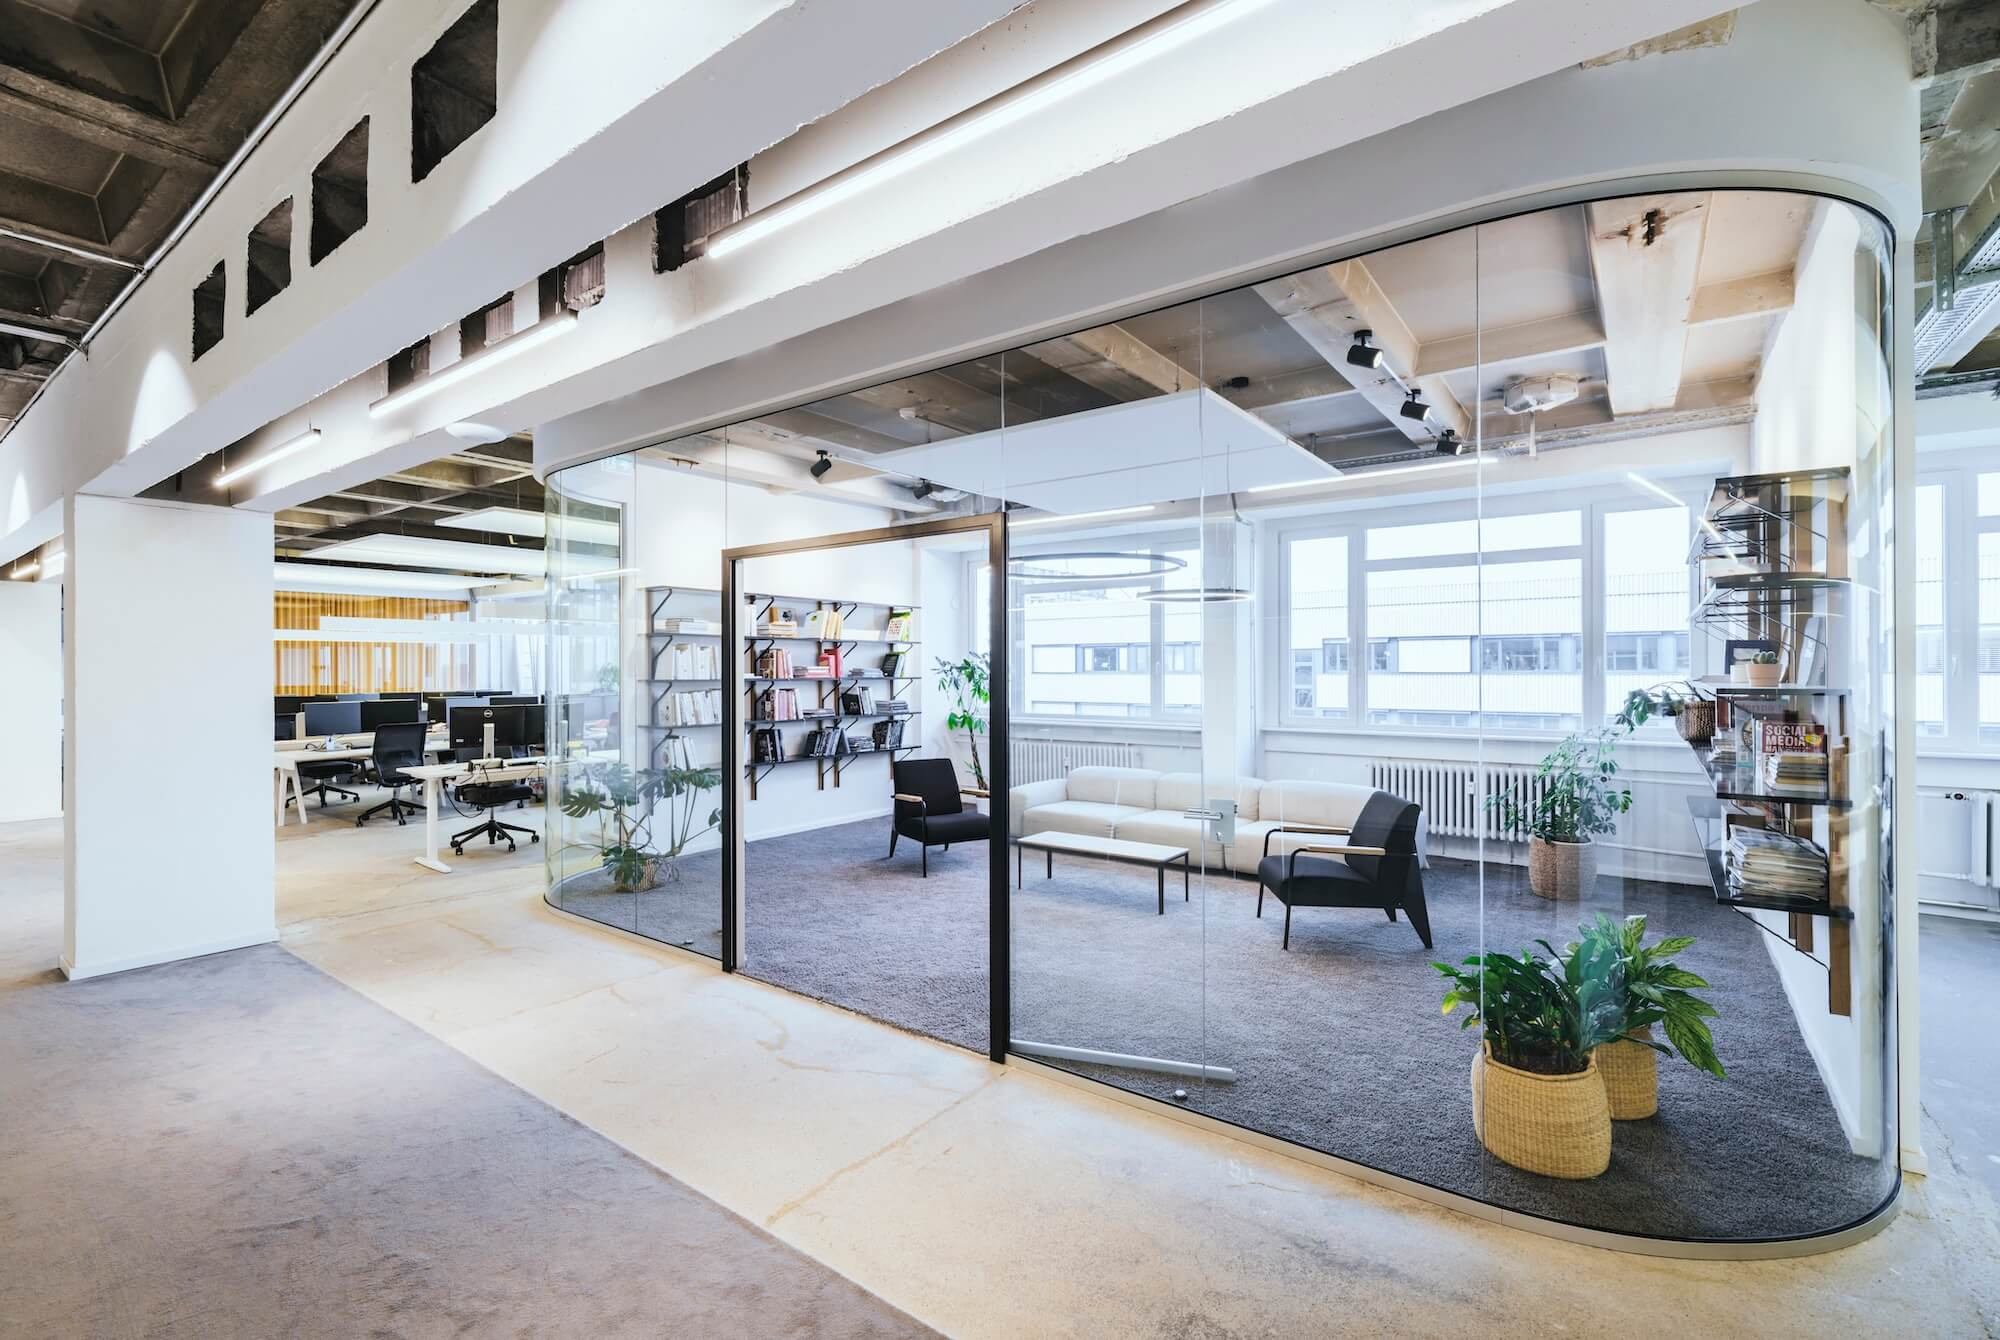 Open Space Büro Startup Kitchen Stories Architekturbüro TKEZ Bene Glastrennwand Biblitohek